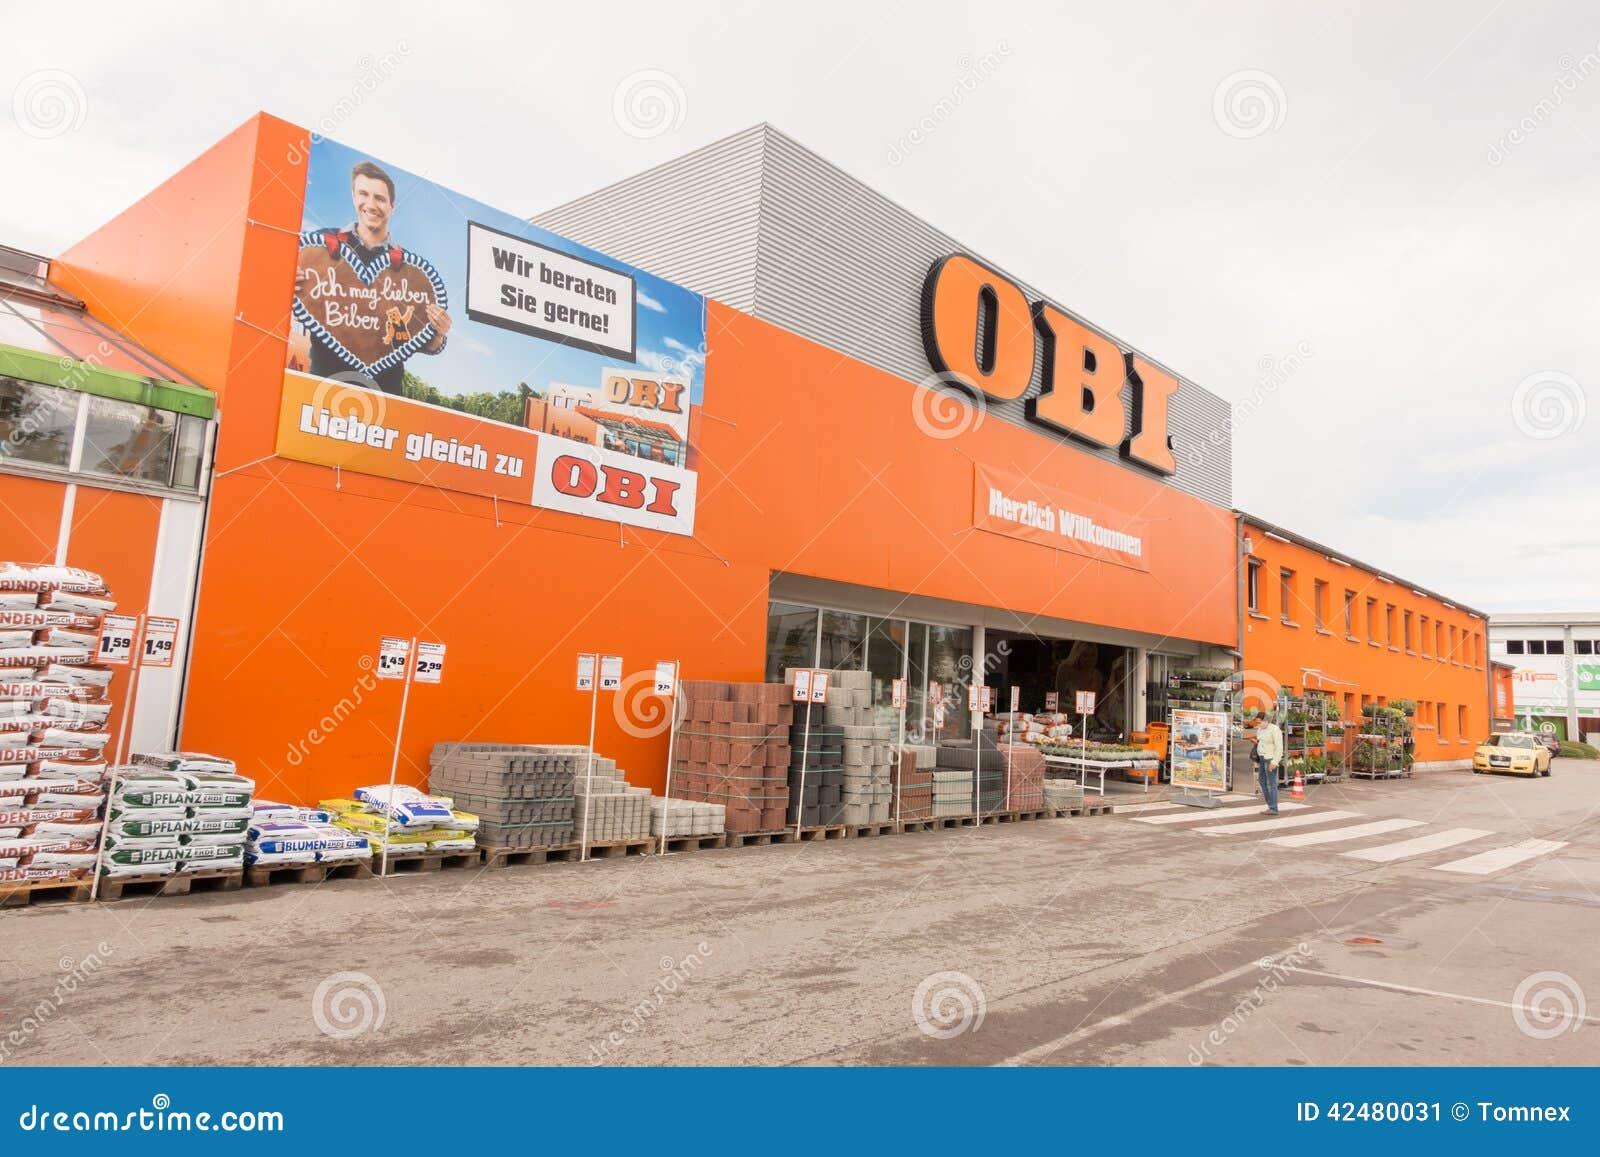 Obi Germany